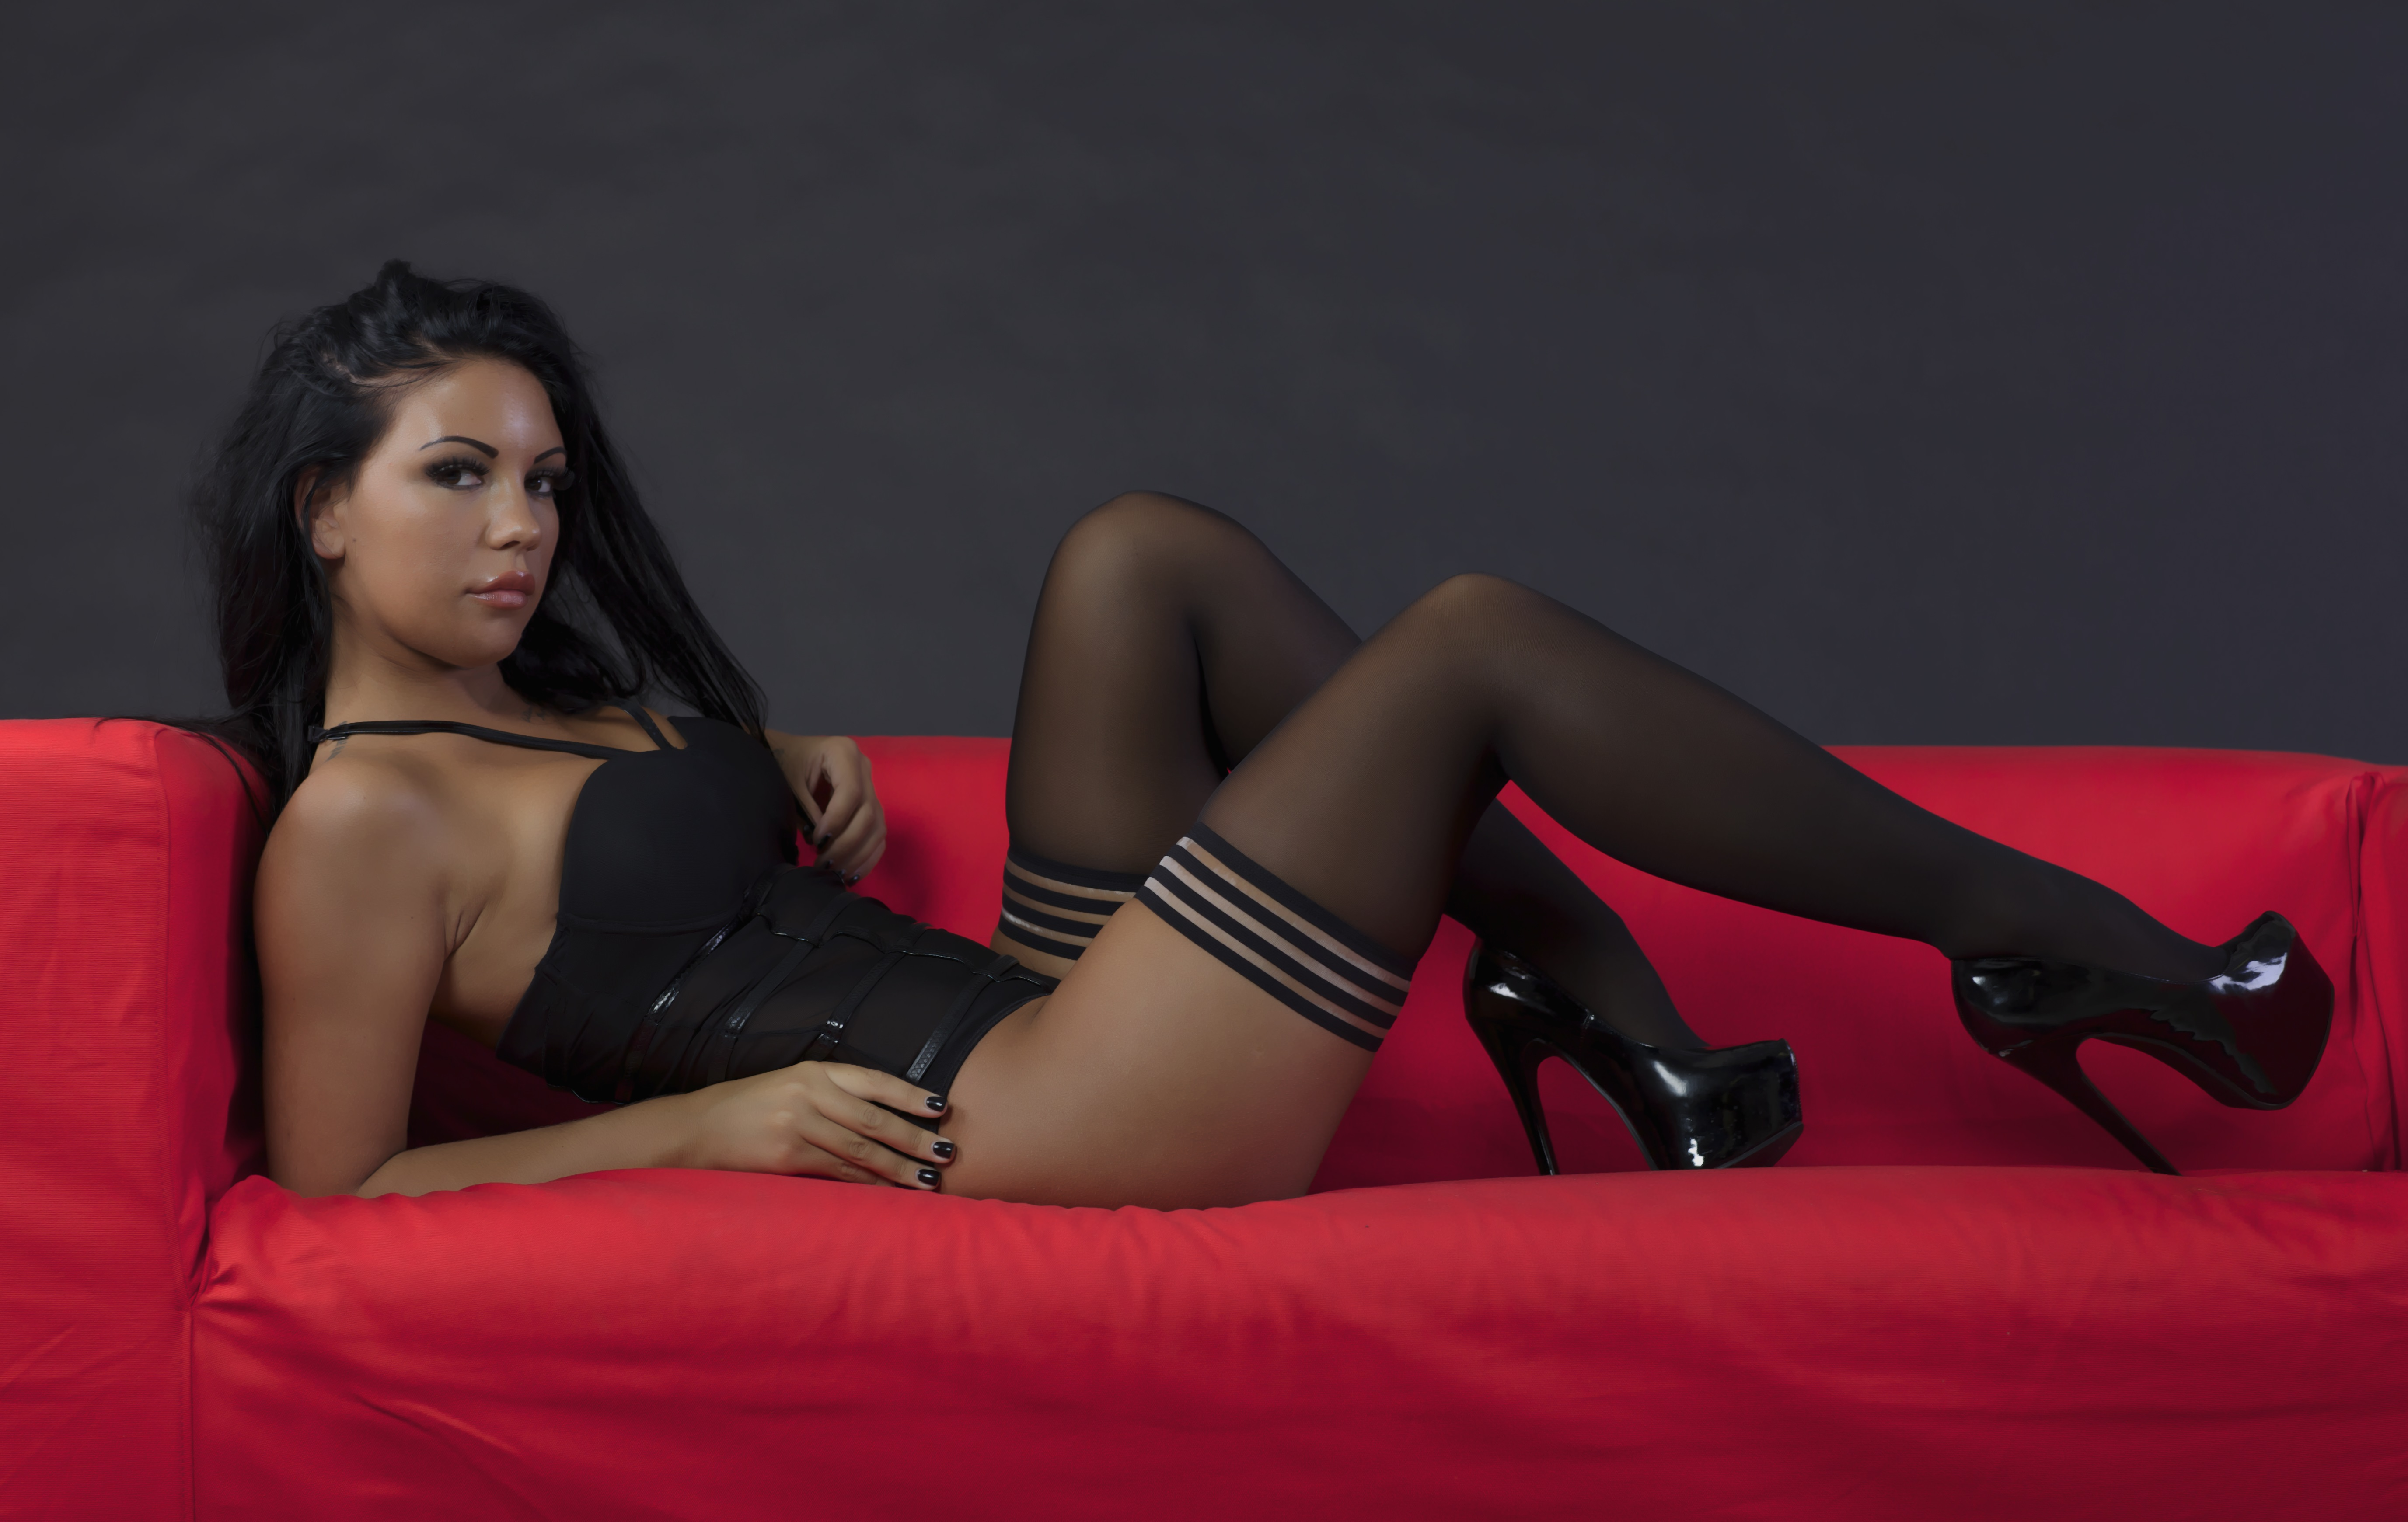 Wallpaper Stockings, Heels, Teen, Tan, Tanned, Lingerie -8680